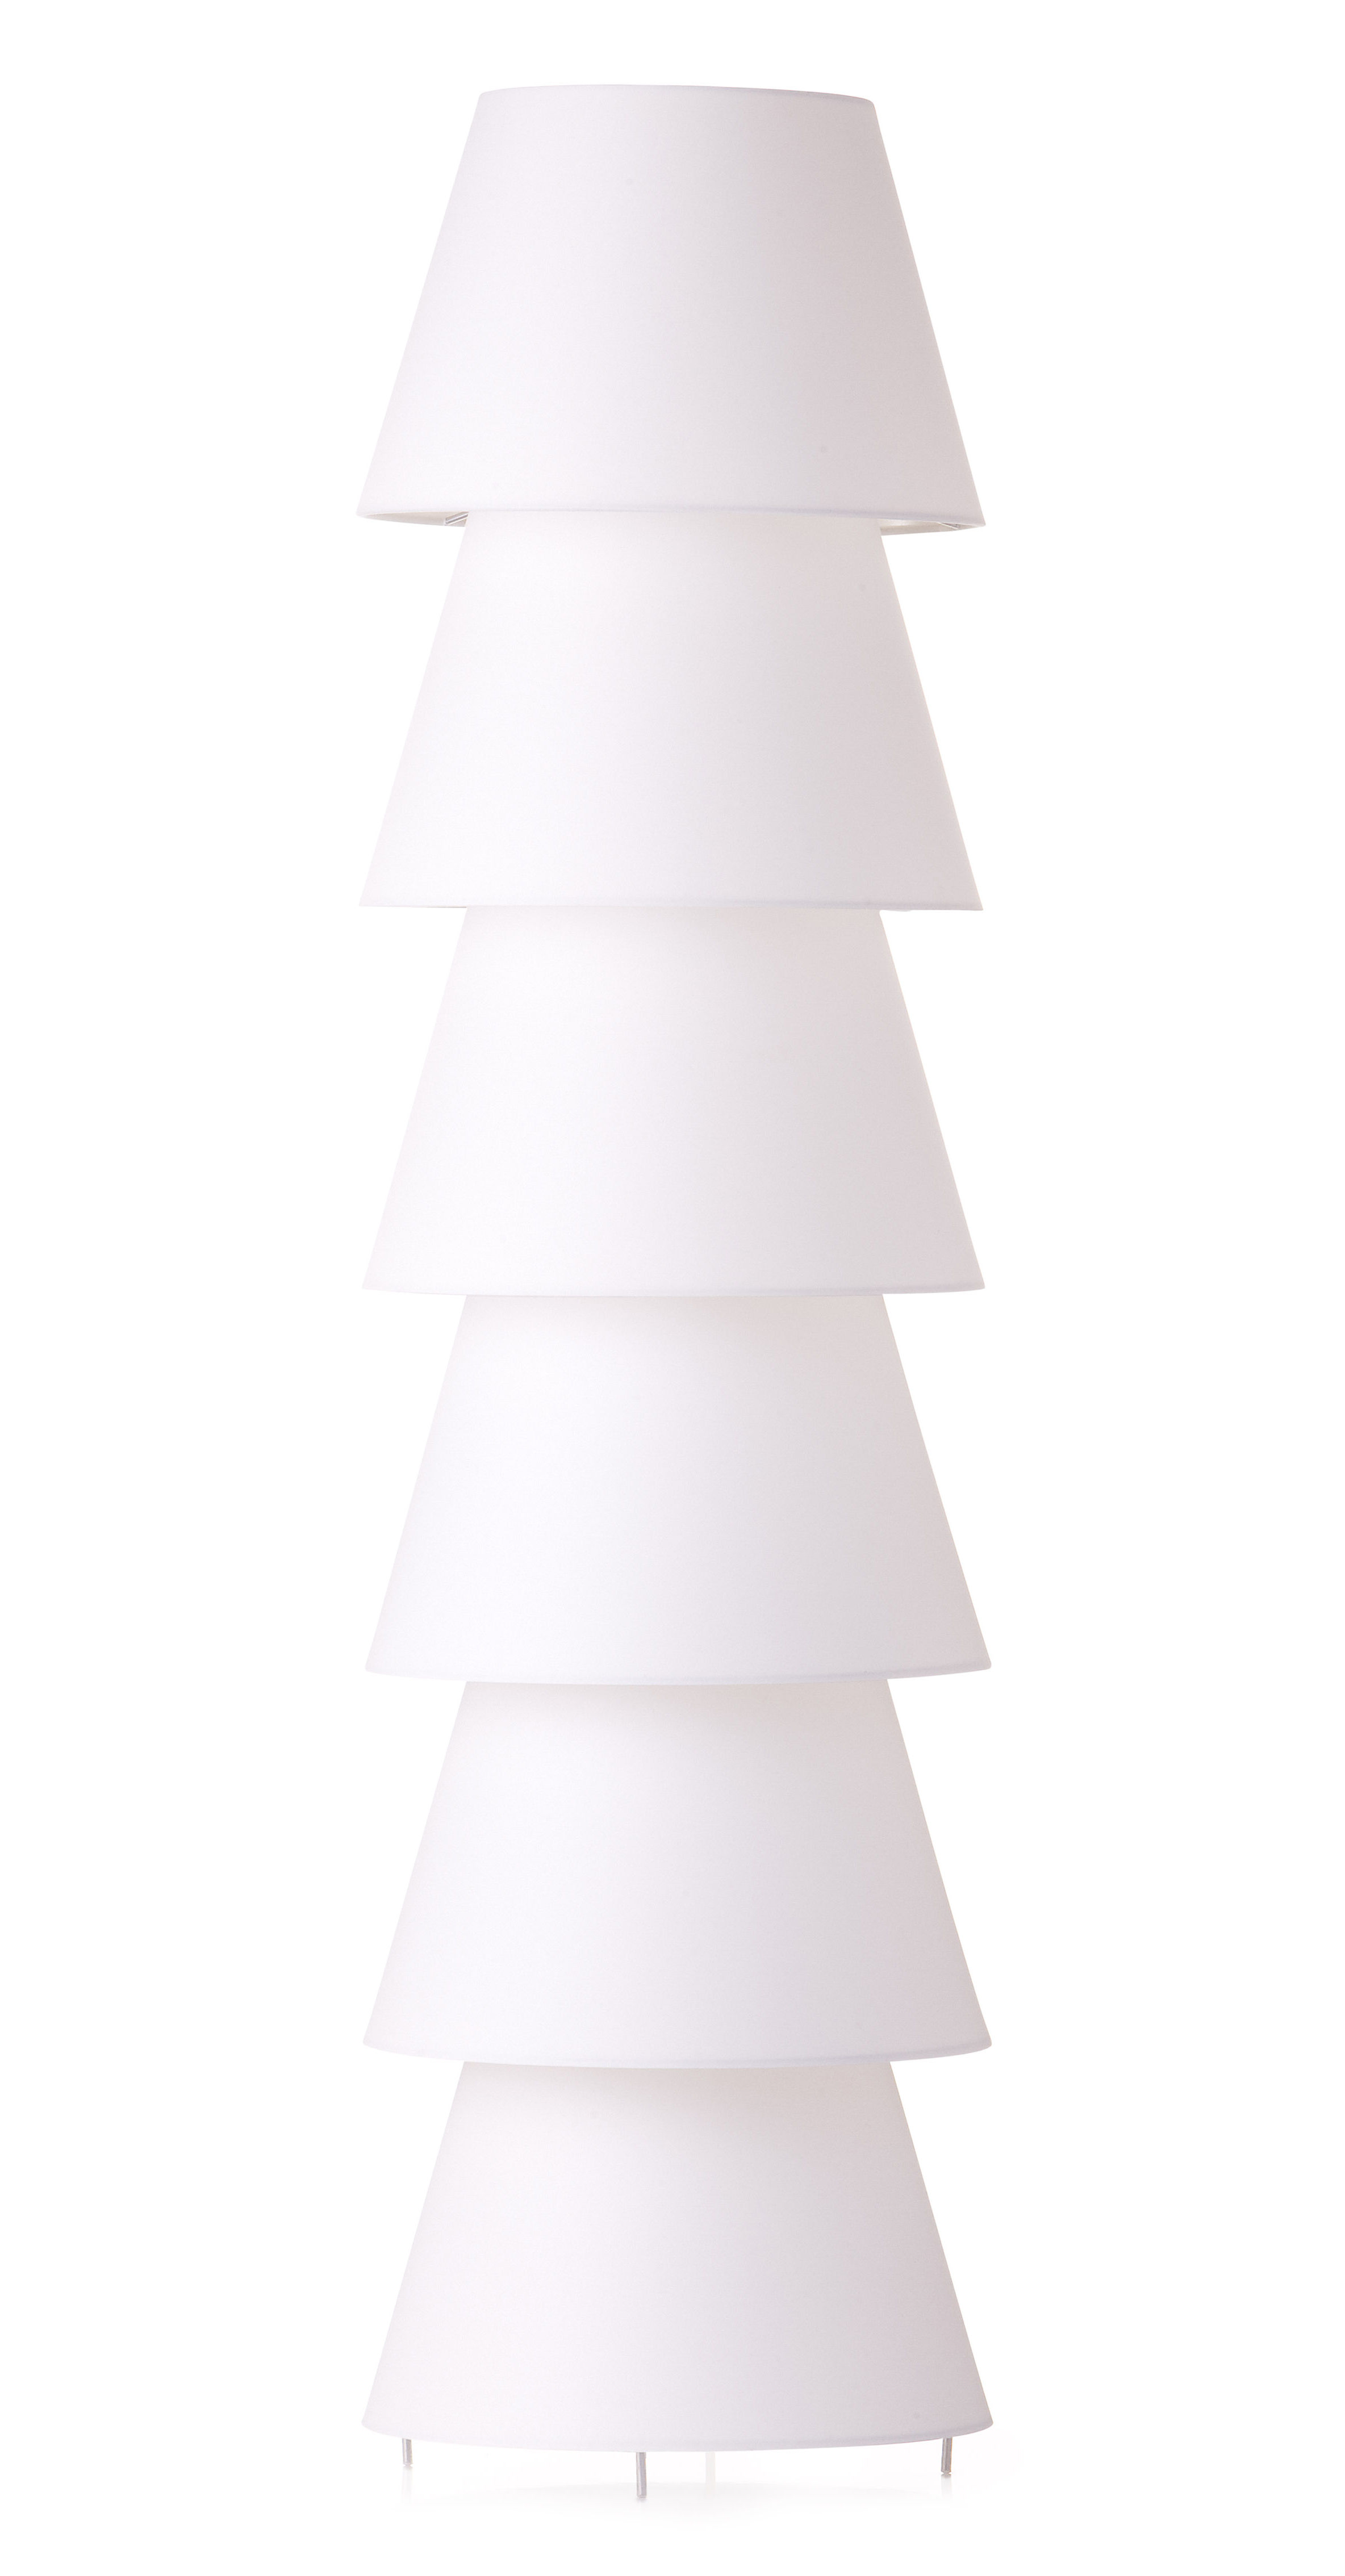 Lighting - Floor lamps - Set Up Shade Floor lamp by Moooi - H 116 cm - Cotton